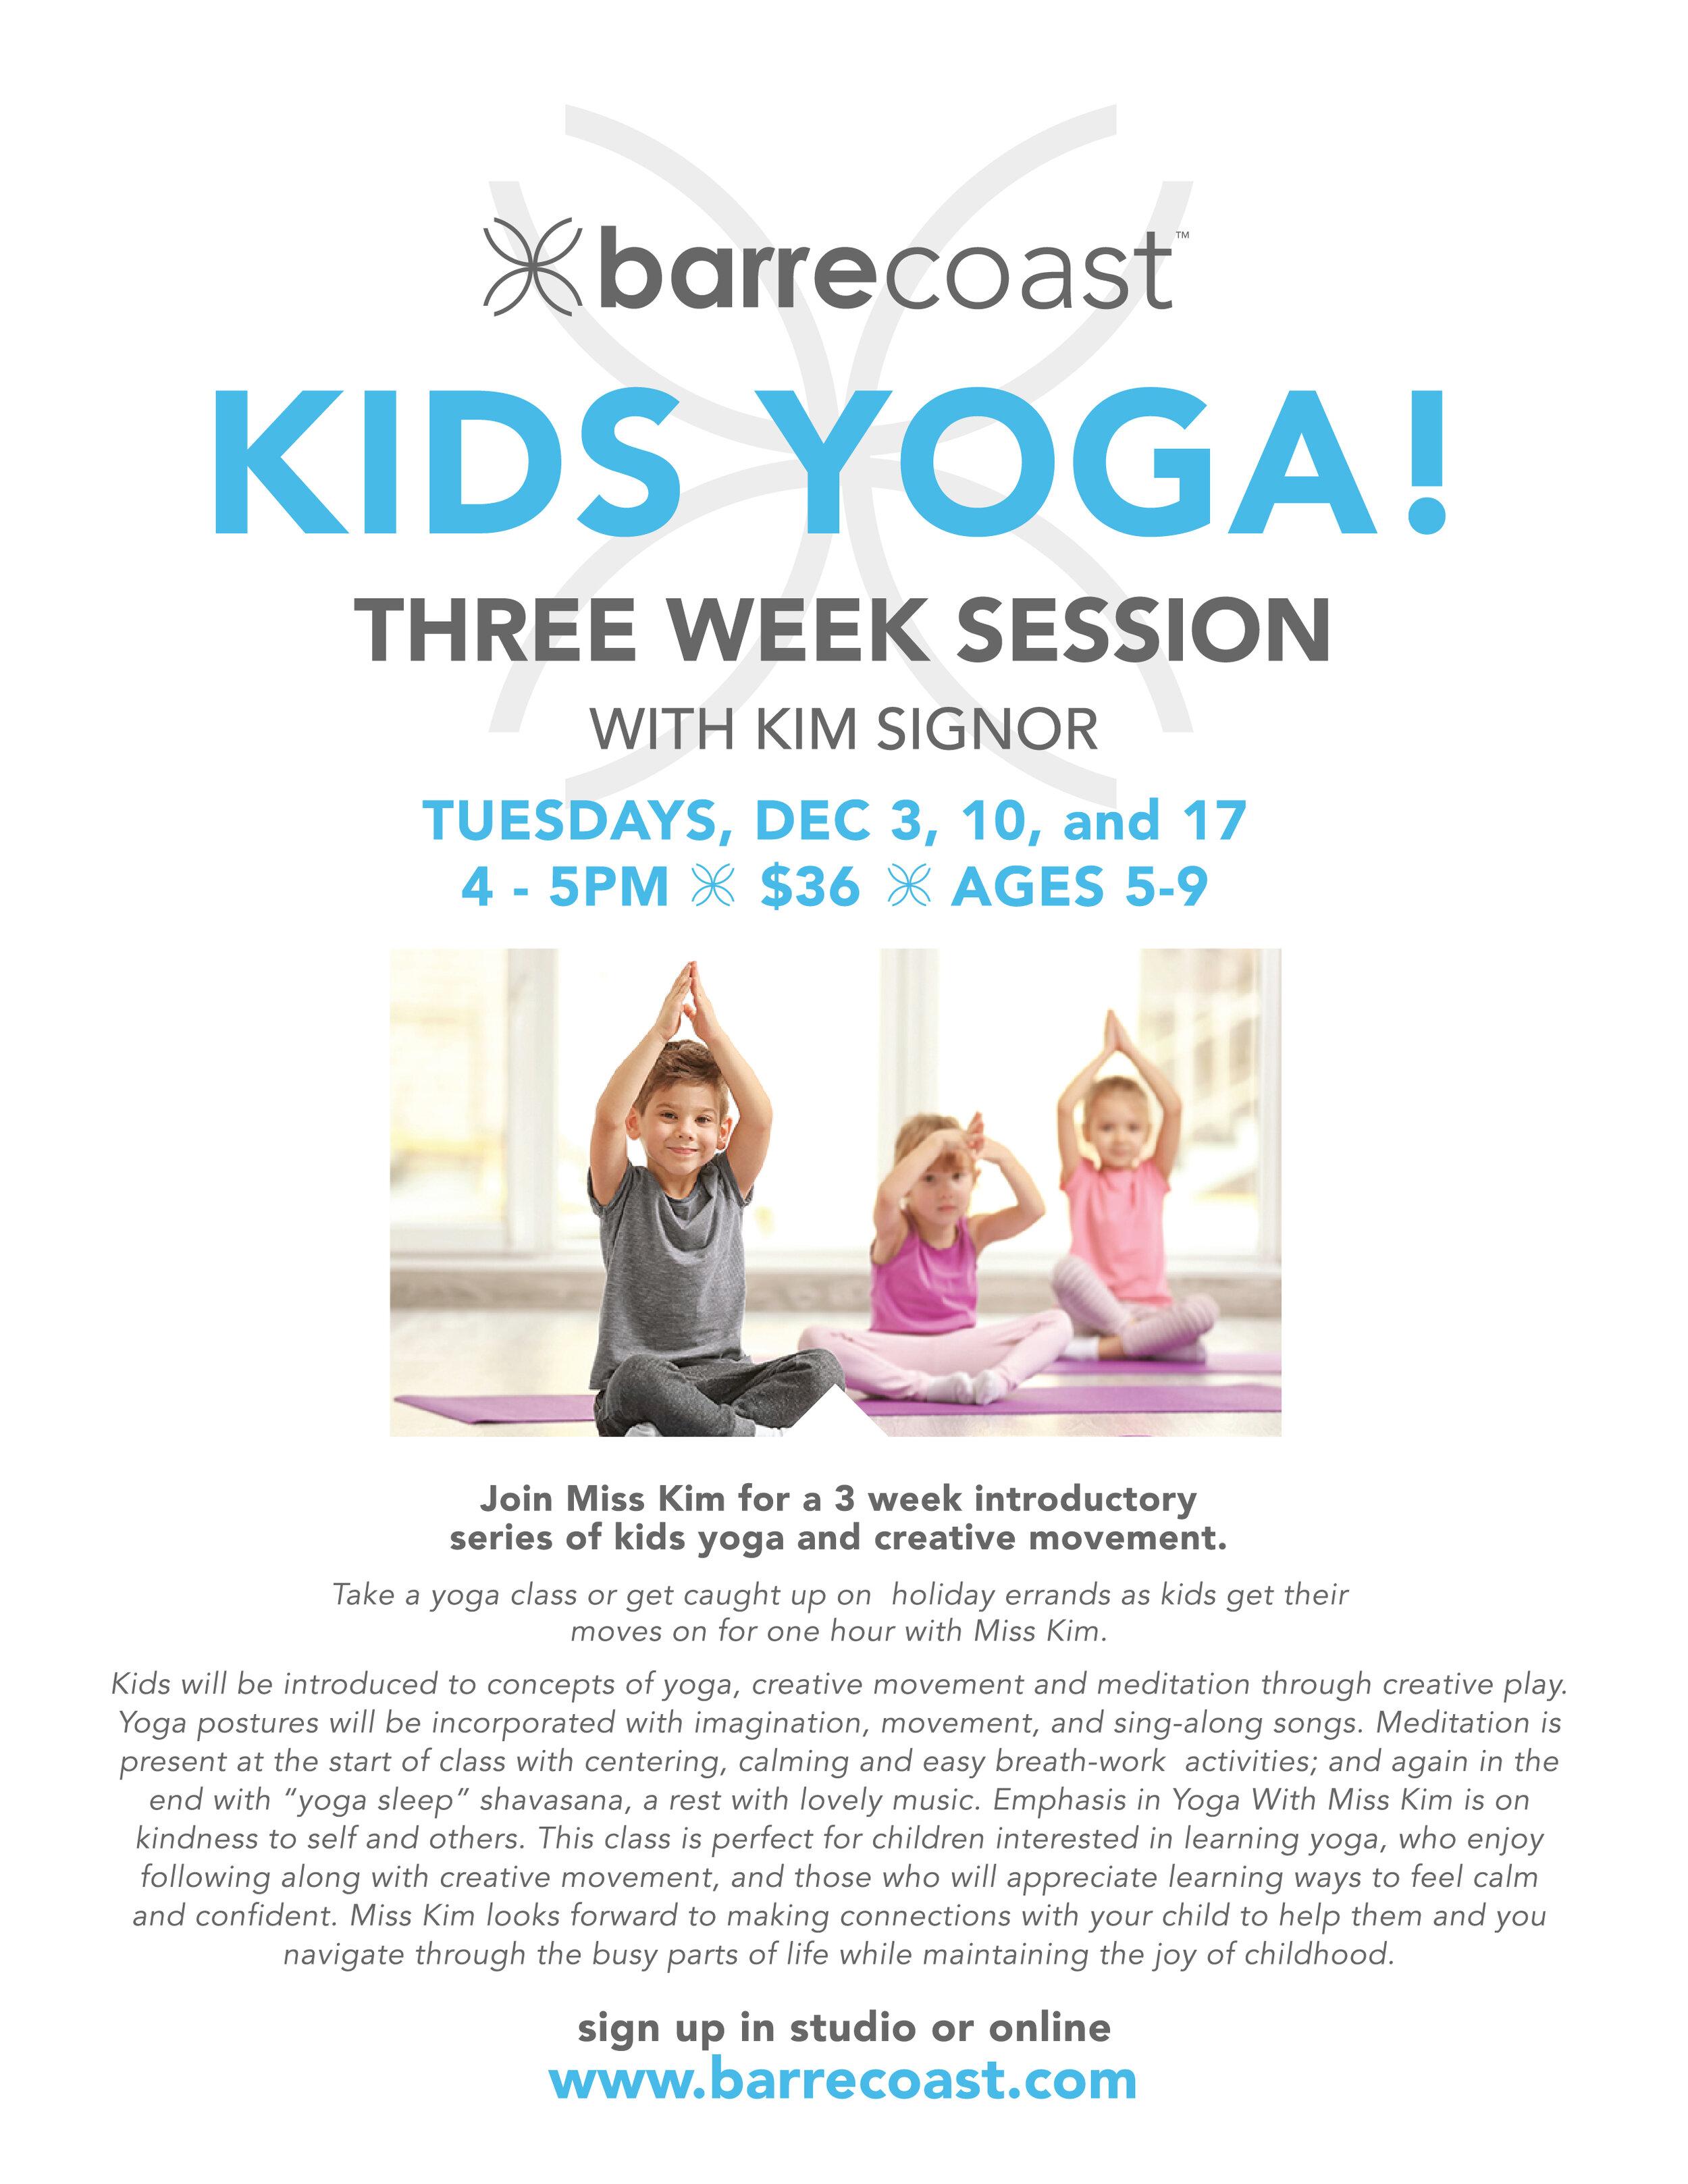 Copy Of Kids Yoga Barrecoast